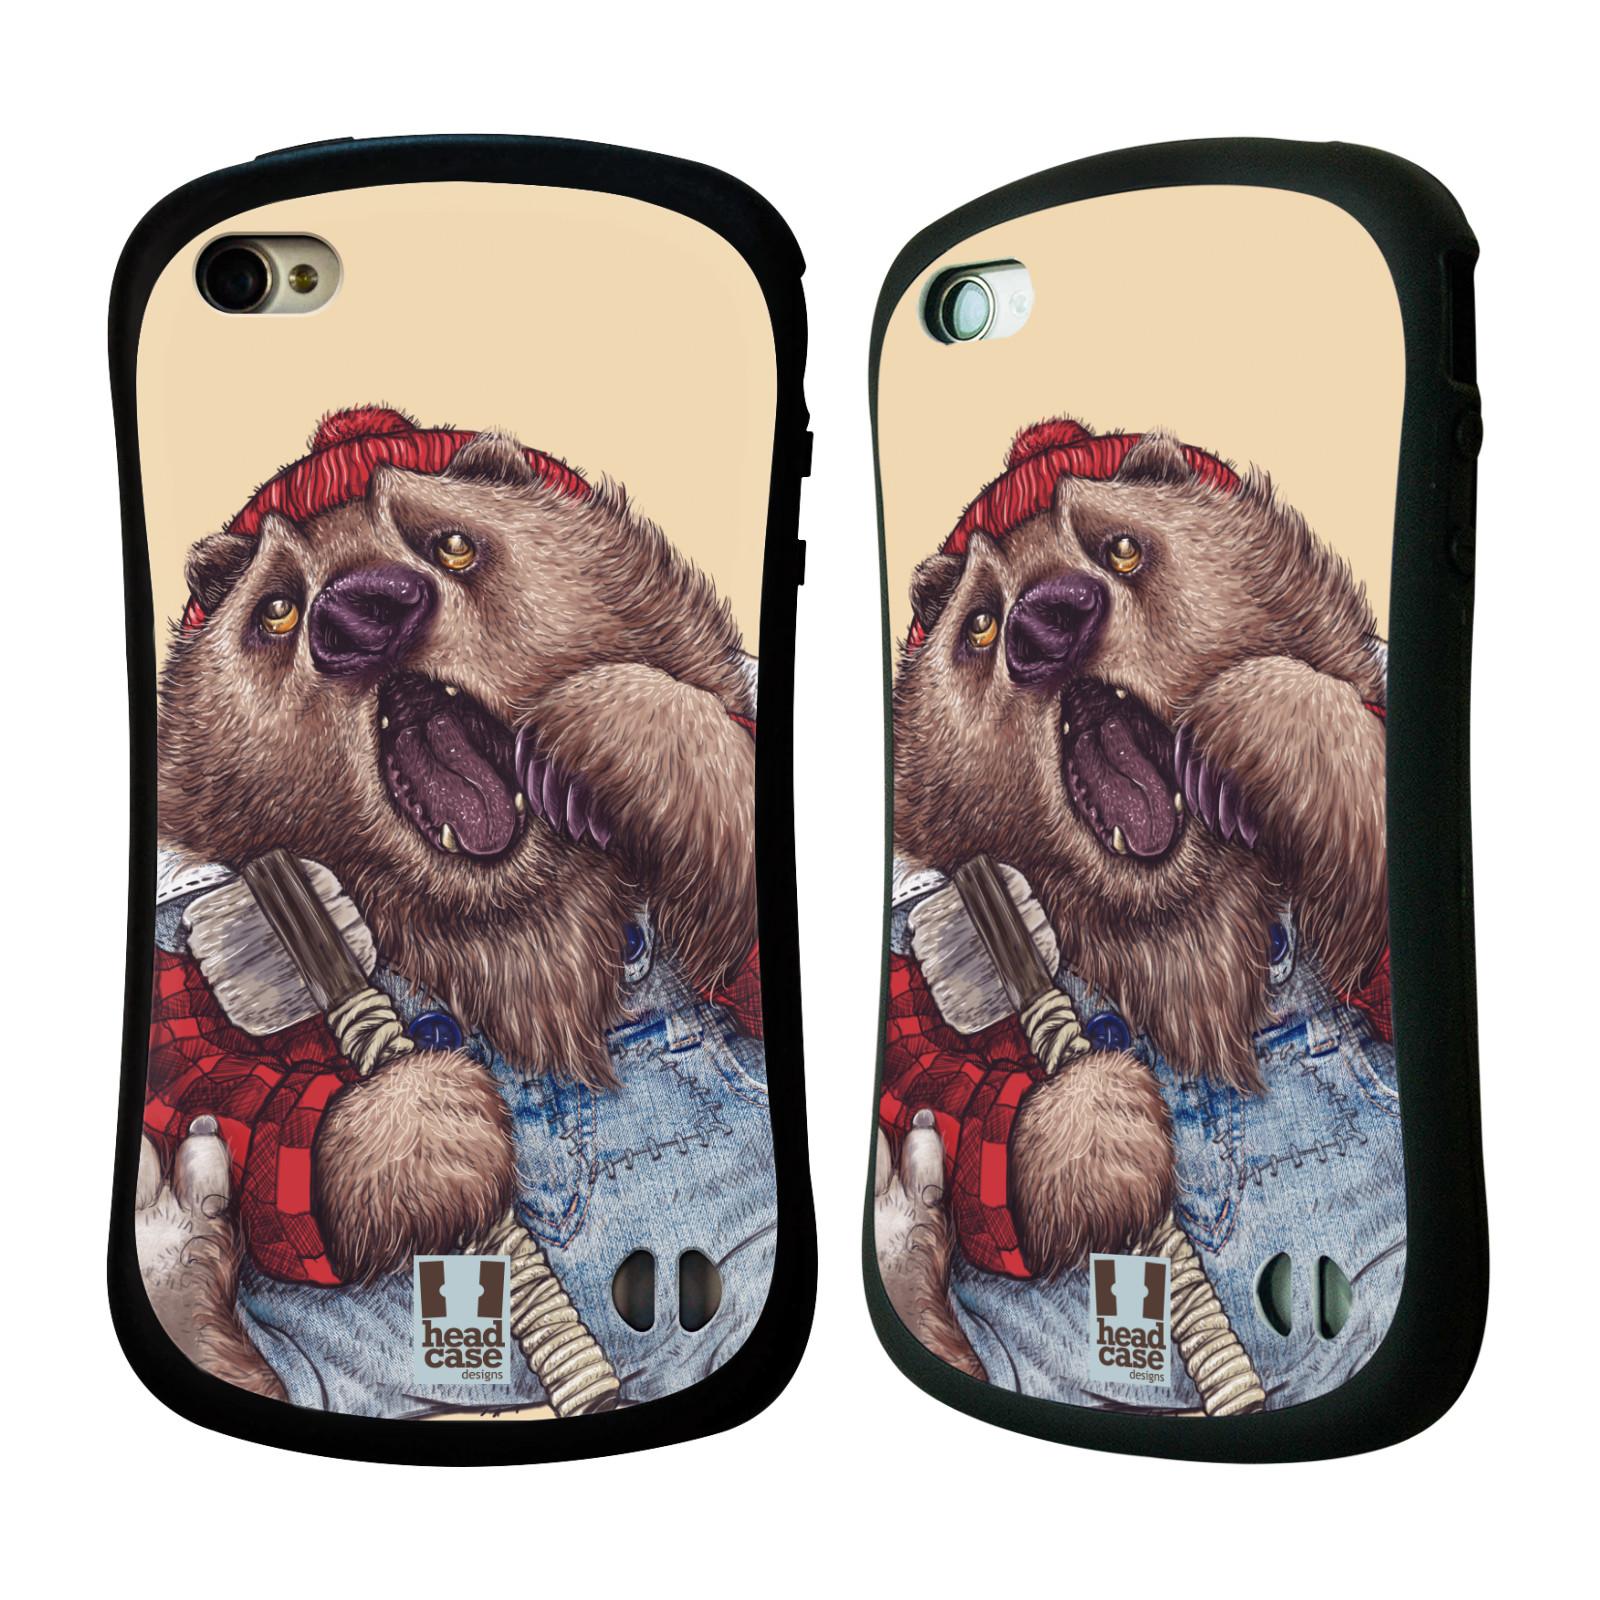 HEAD CASE silikon/plast odolný obal na mobil Apple Iphone 4/4S vzor Kreslená zvířátka medvěd